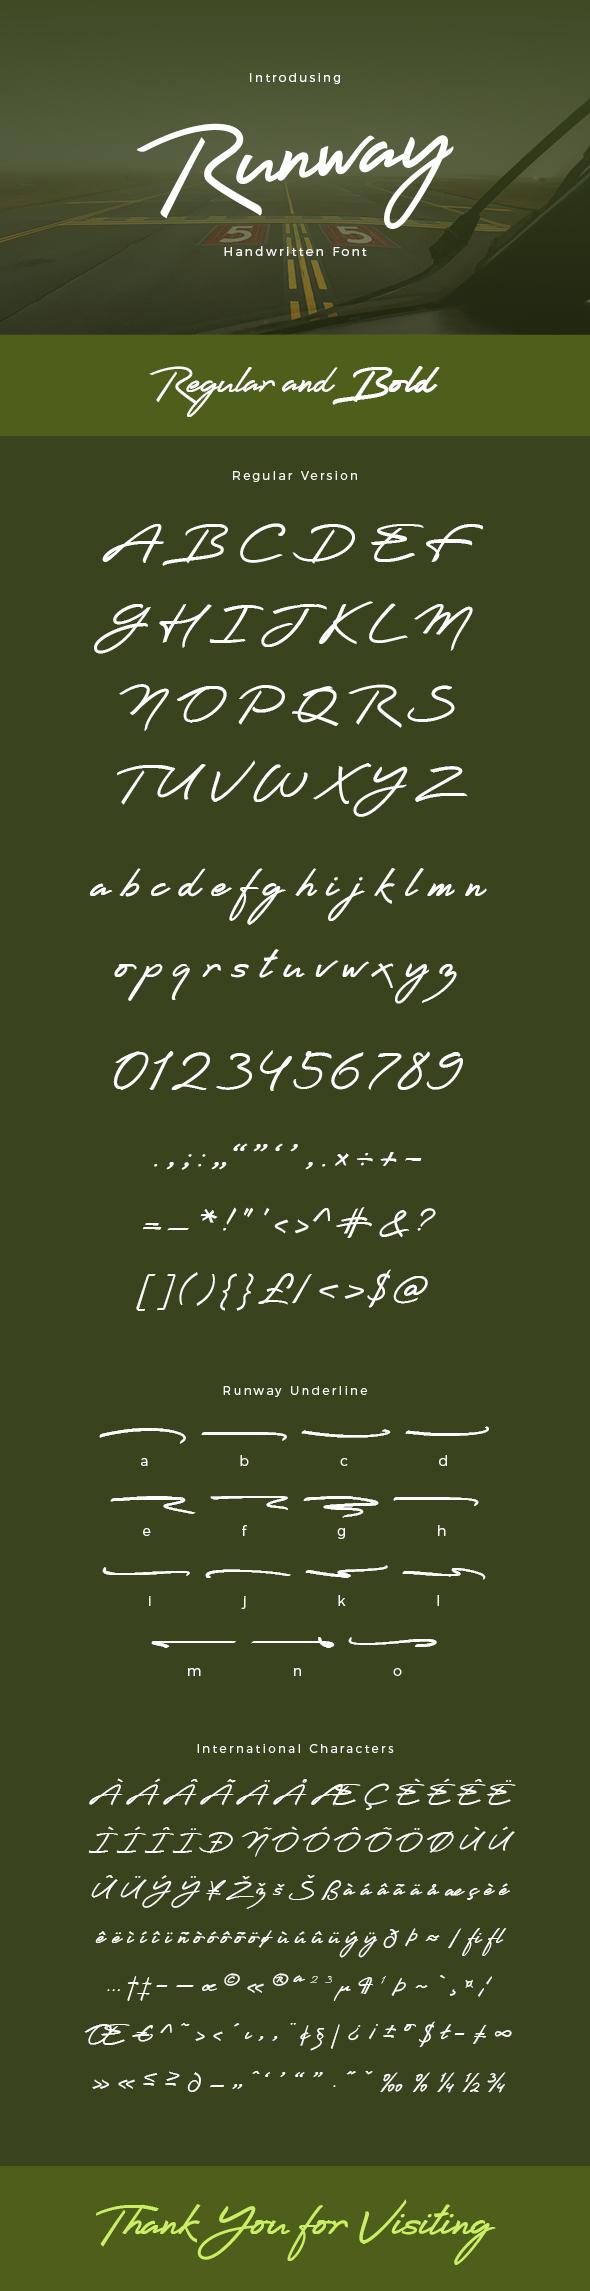 GraphicRiver Runway Handwritten Font 20462386